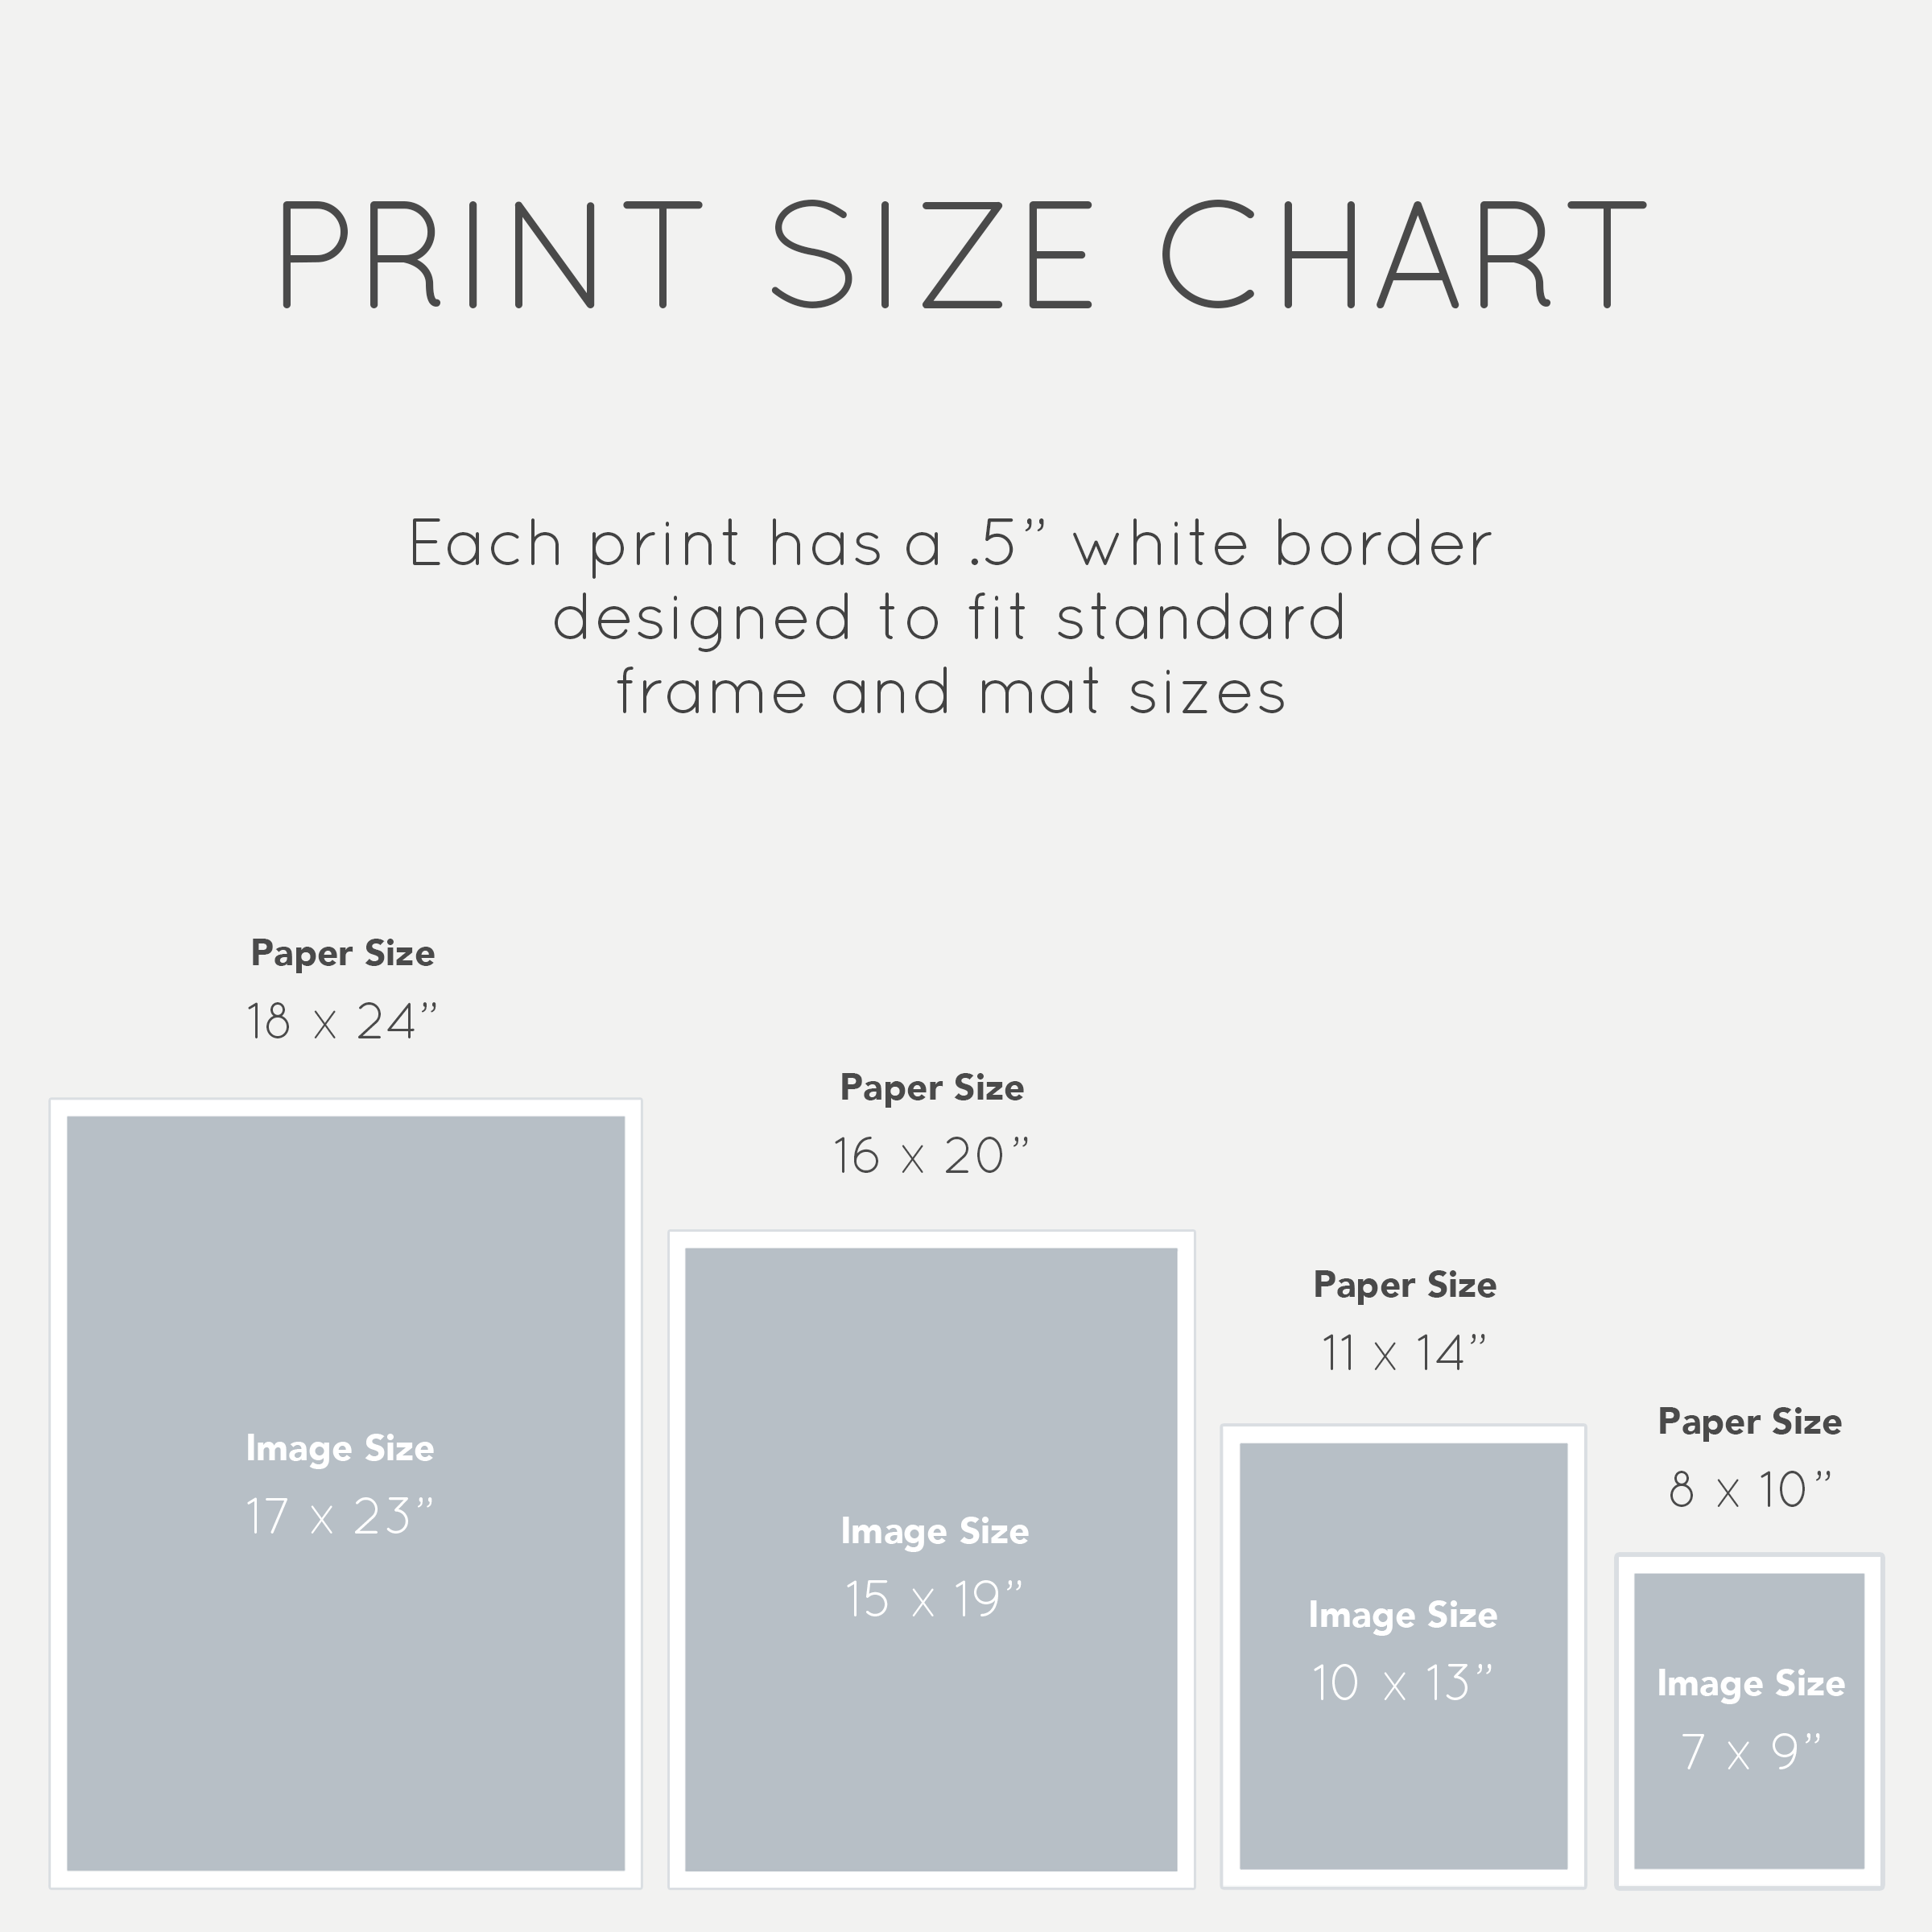 Print-Size-Chart.png